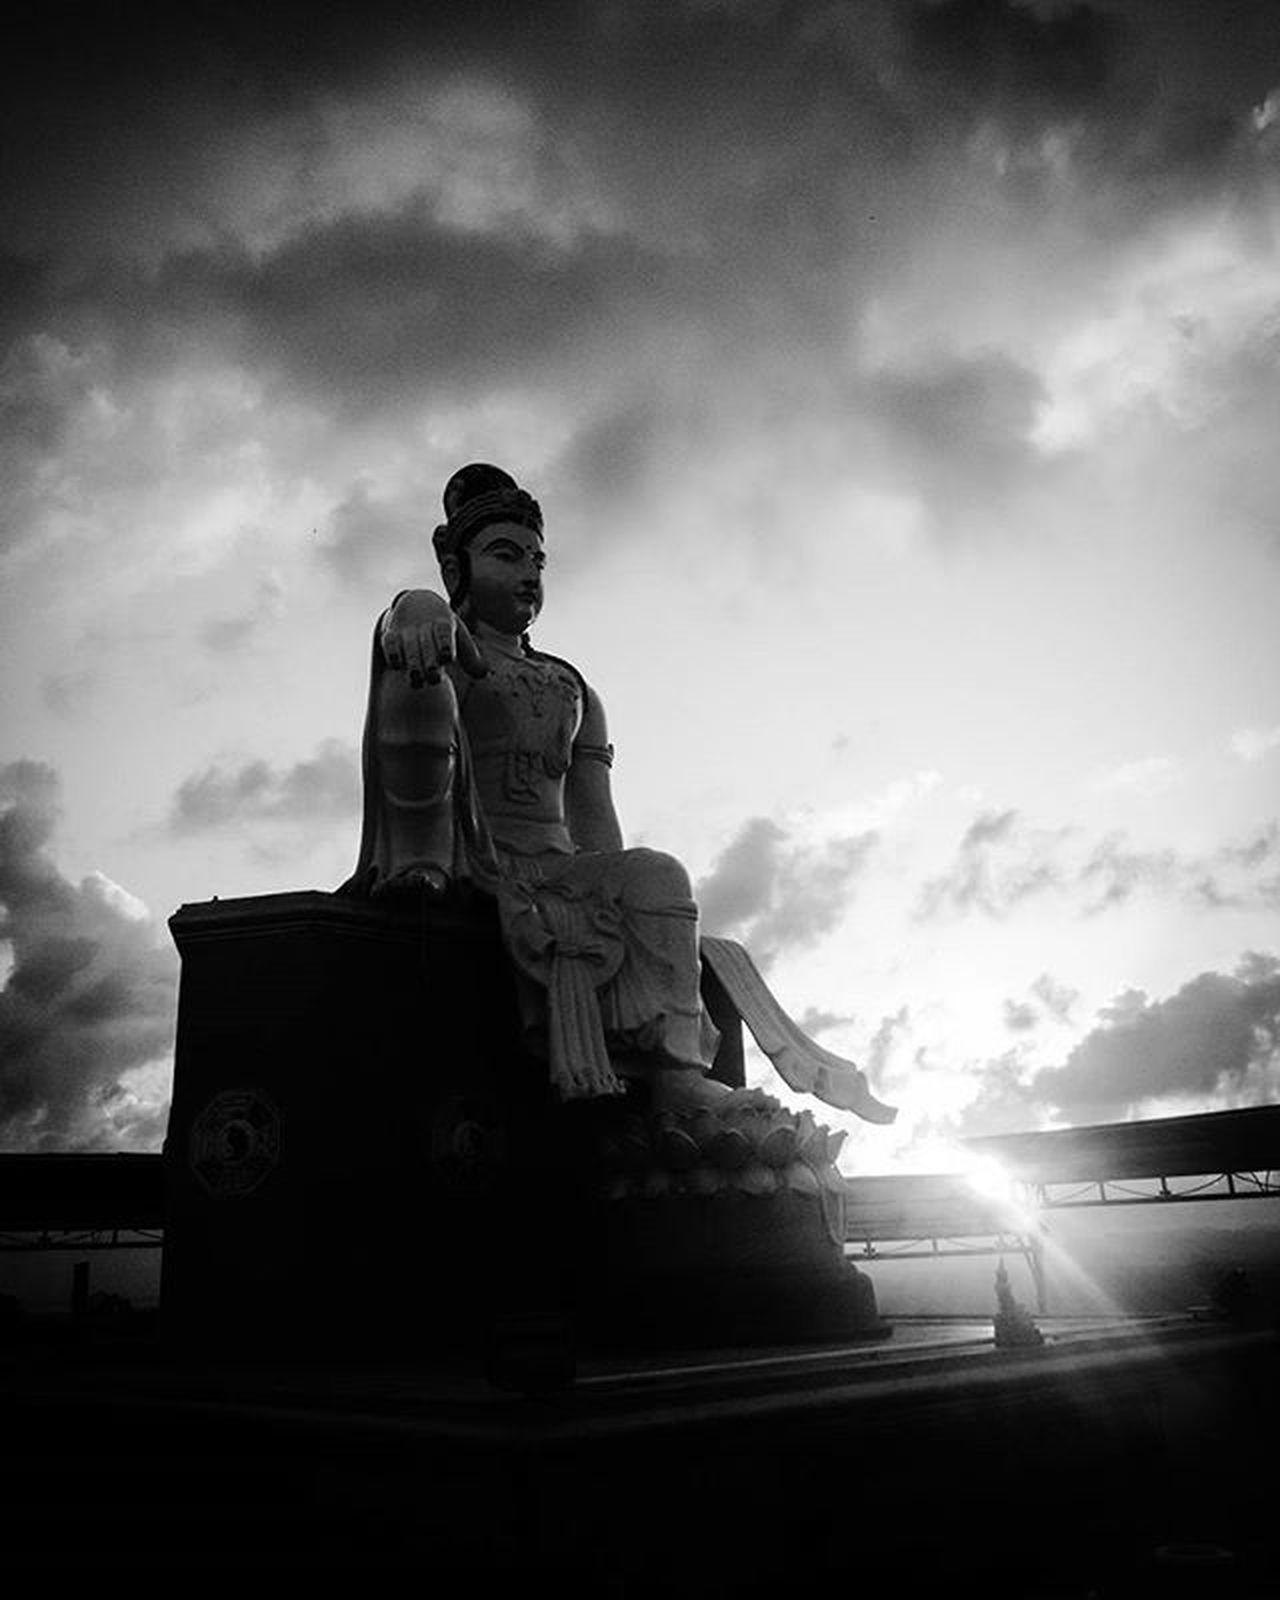 Sunset on a hill near Hat Sairee, Pak Nam, Thailand ThousandMilesJourney.com ASIA Thailand Chumphon Paknam Hatsairee Thailandphoto Bwphoto Buddhas Sunset_pics Bwphotography Statues Travelaroundtheworld